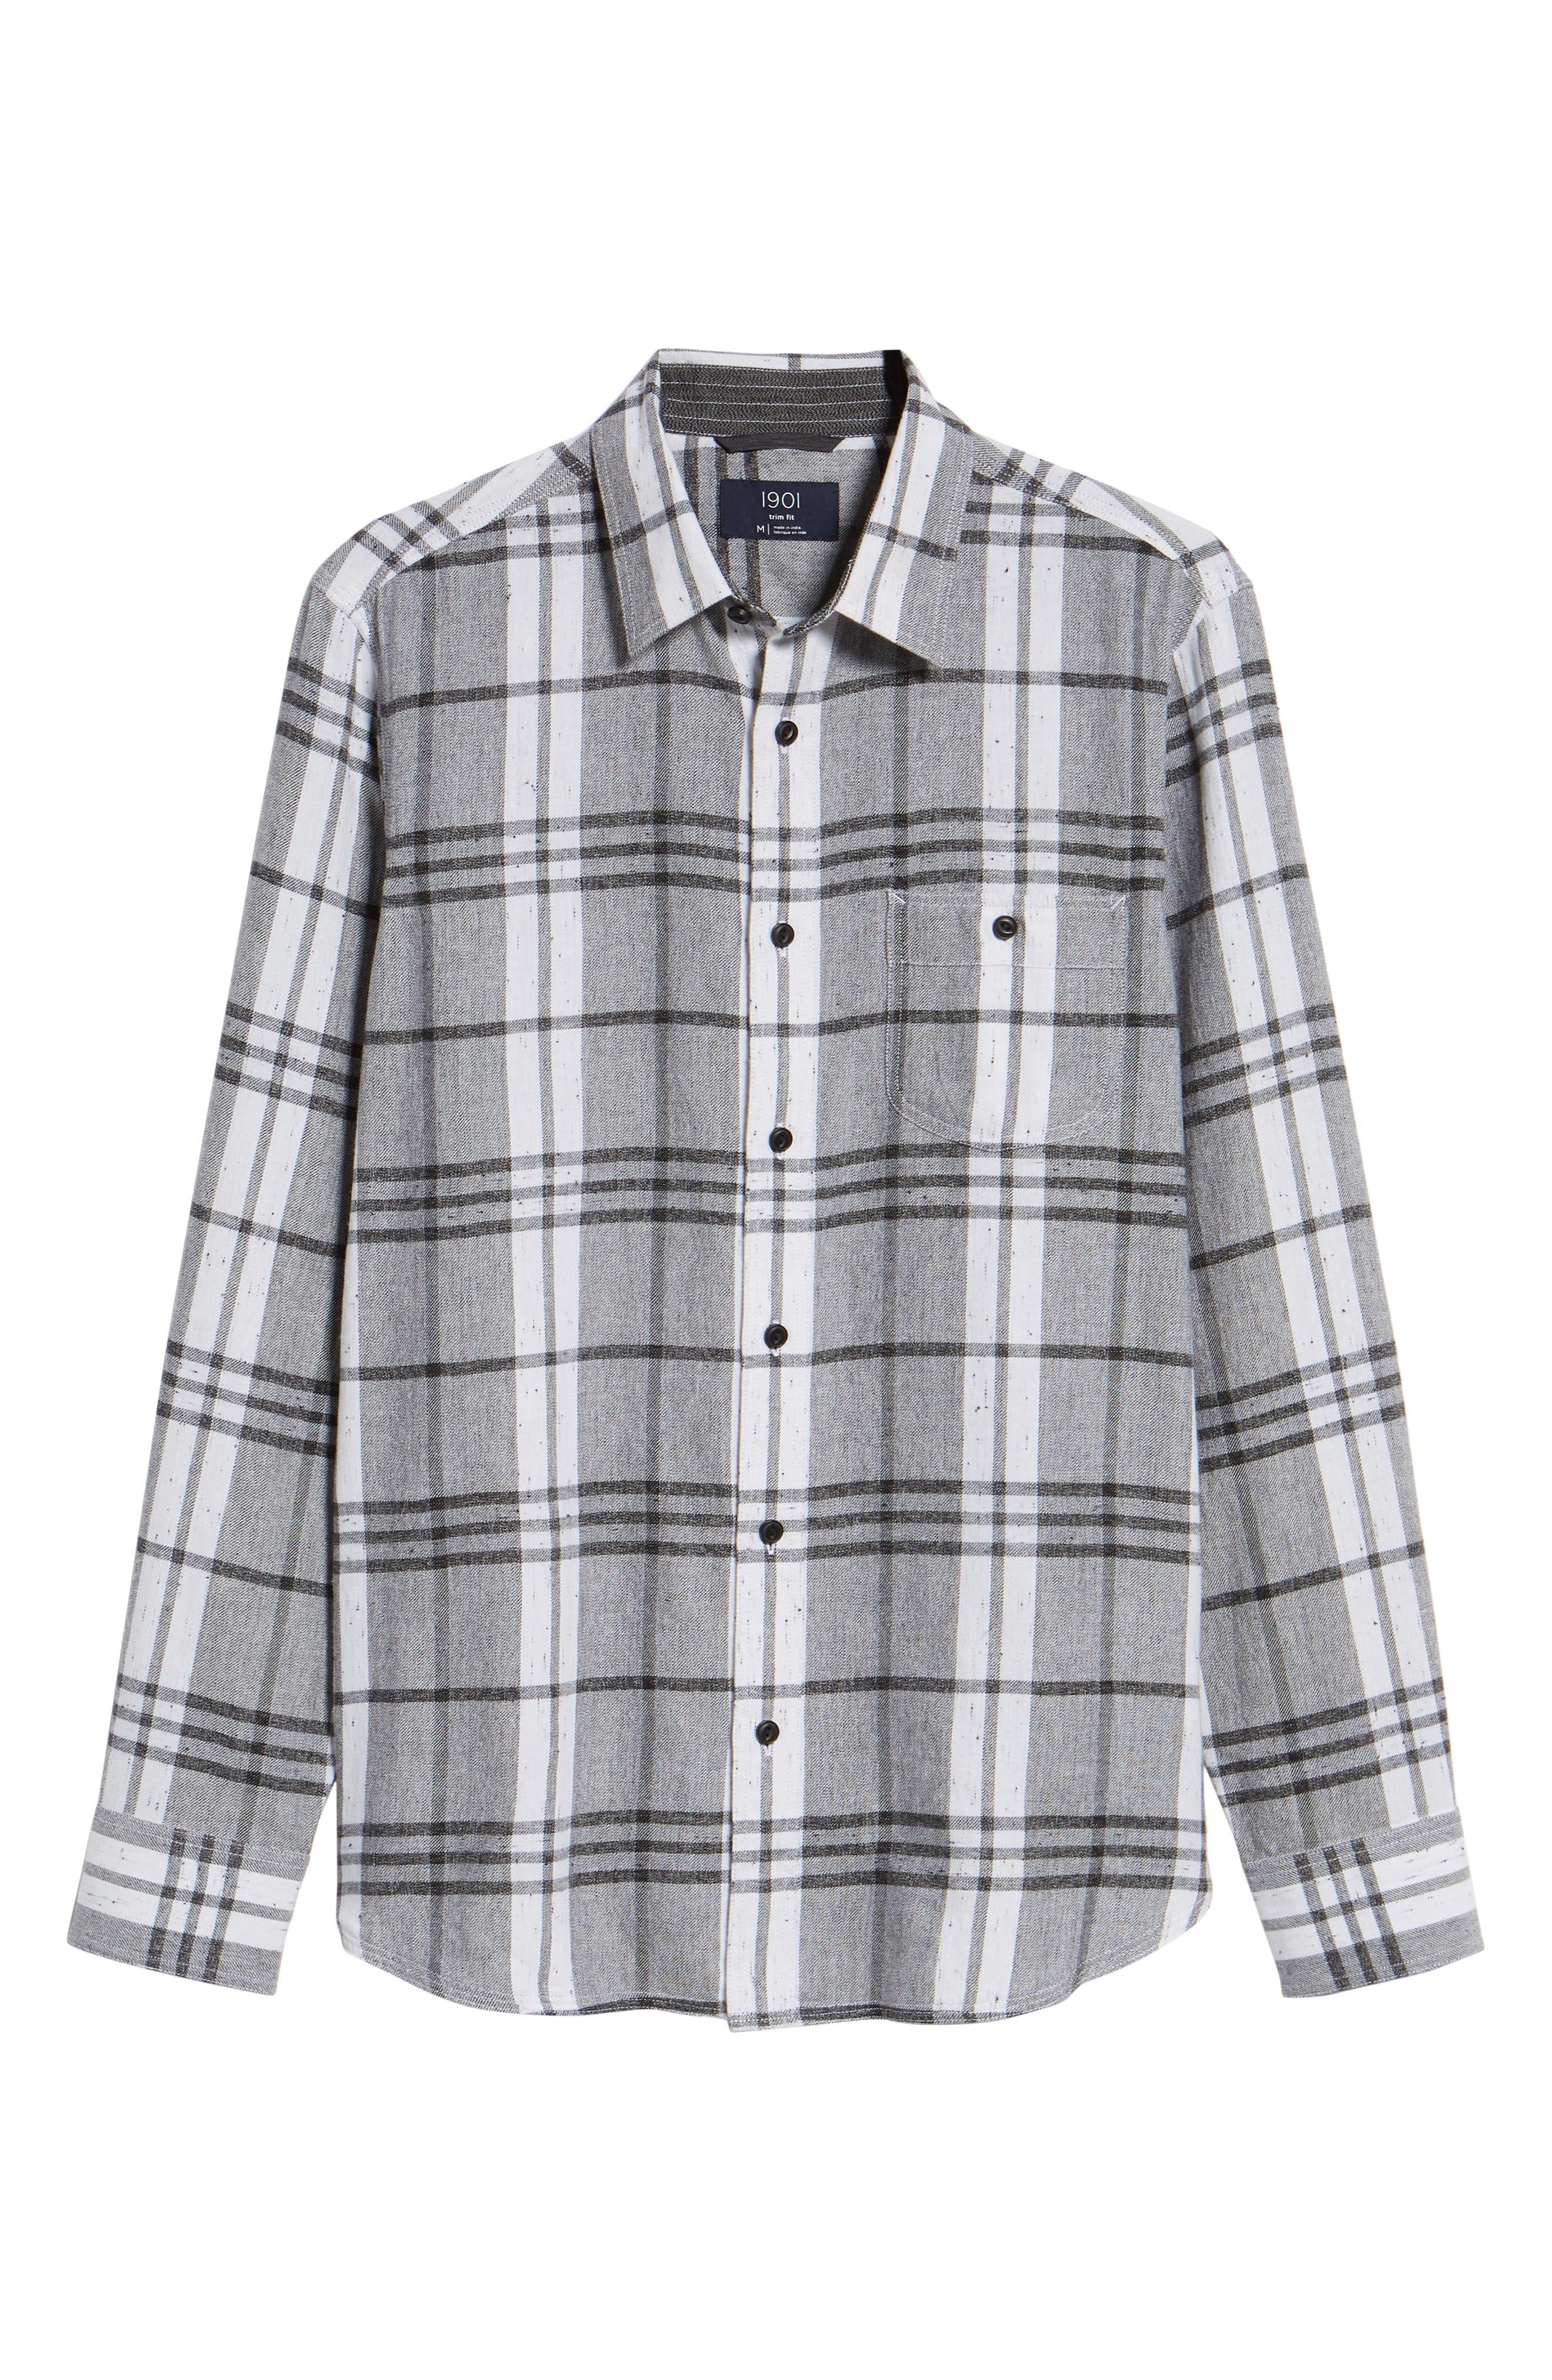 Trim Fit Brushed Plaid Utility Shirt,                             Alternate thumbnail 5, color,                             GREY CASTLEROCK NEP PLAID